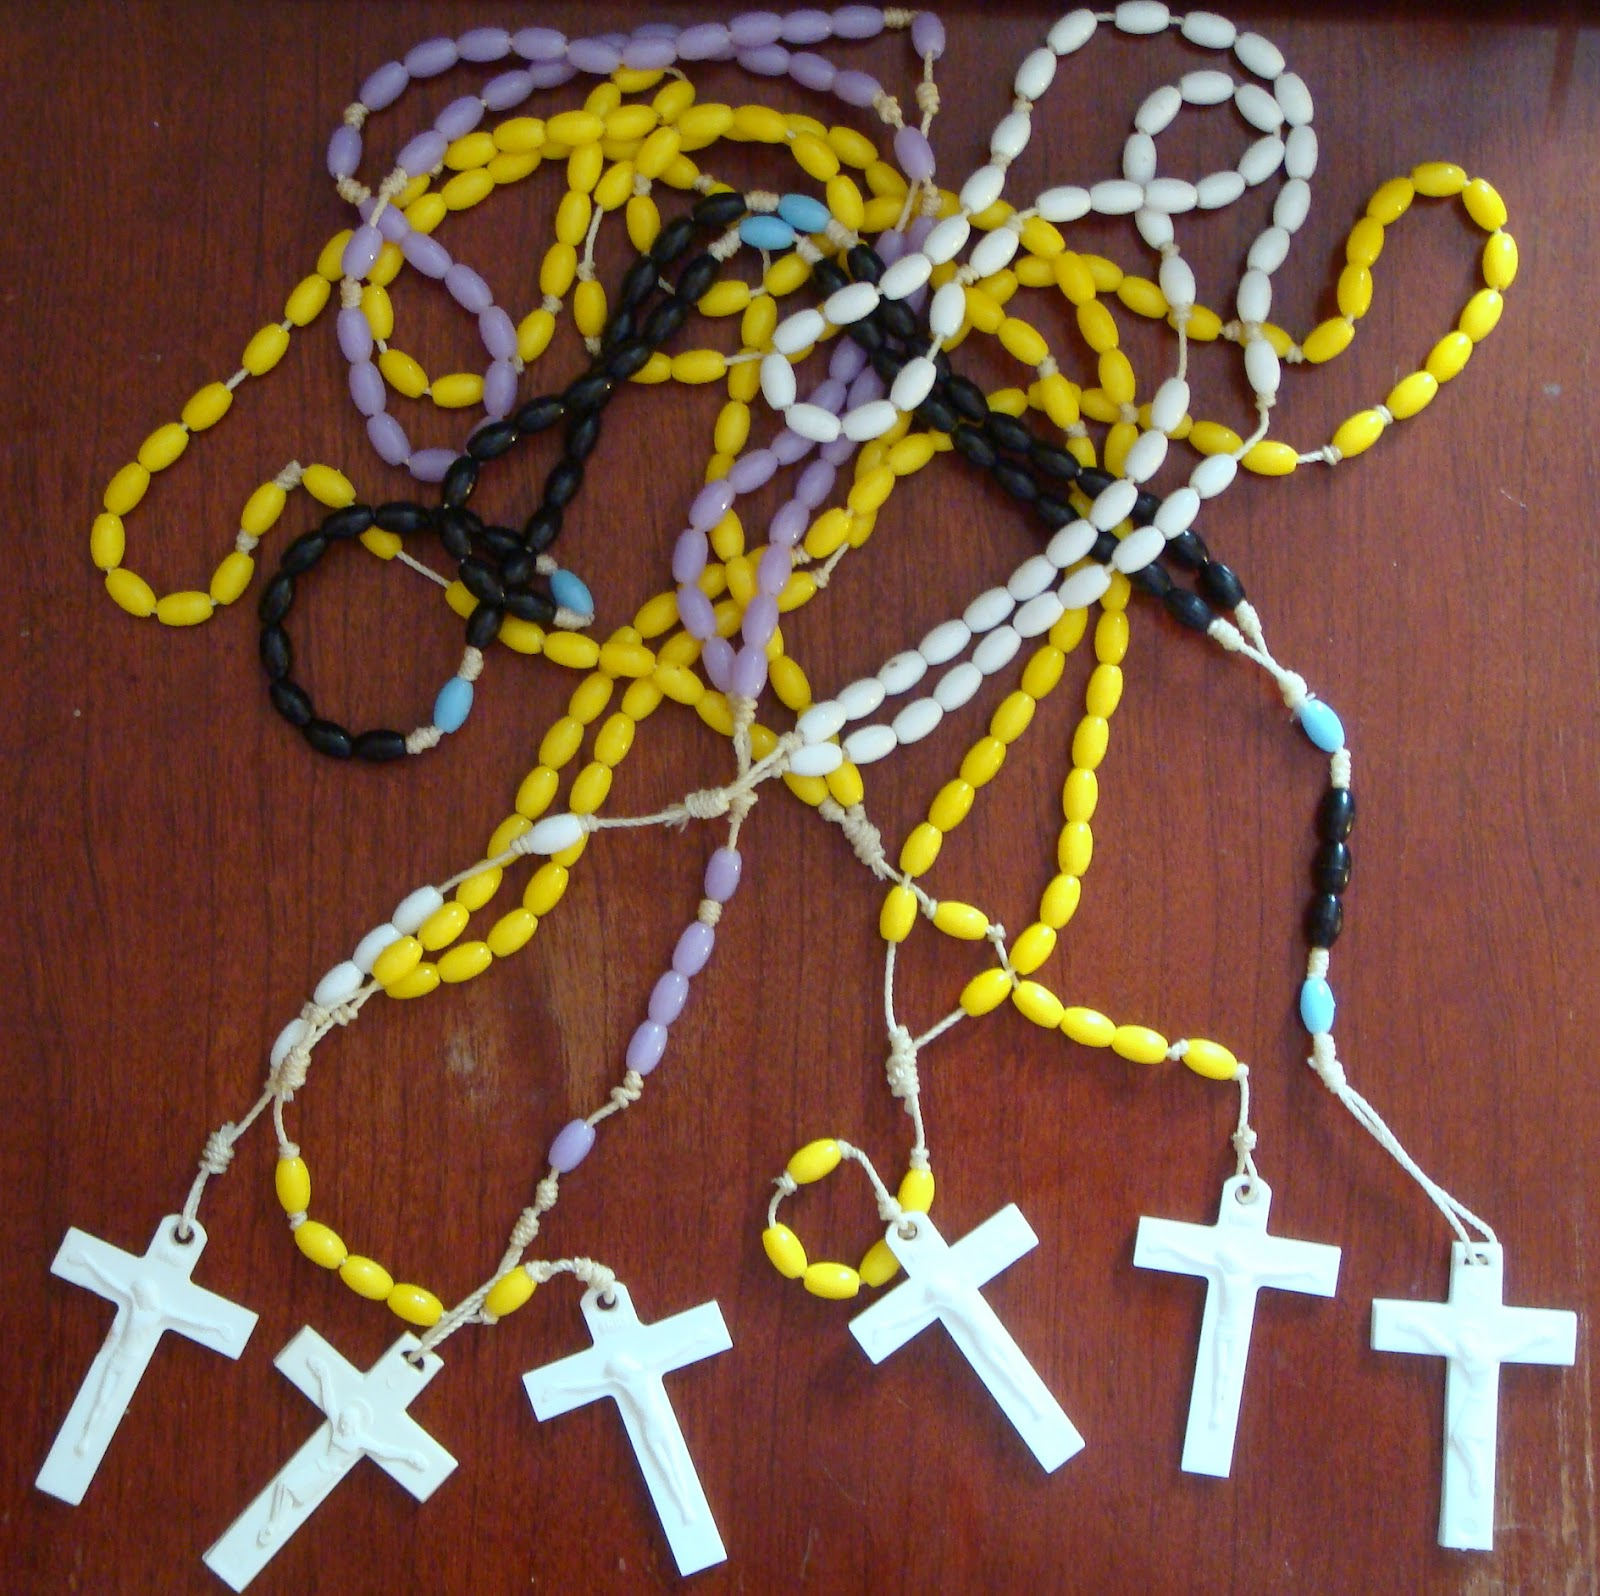 Saints2be at a glance catholic info spiritual resources and check your plastic rosaries for satanic symbols buycottarizona